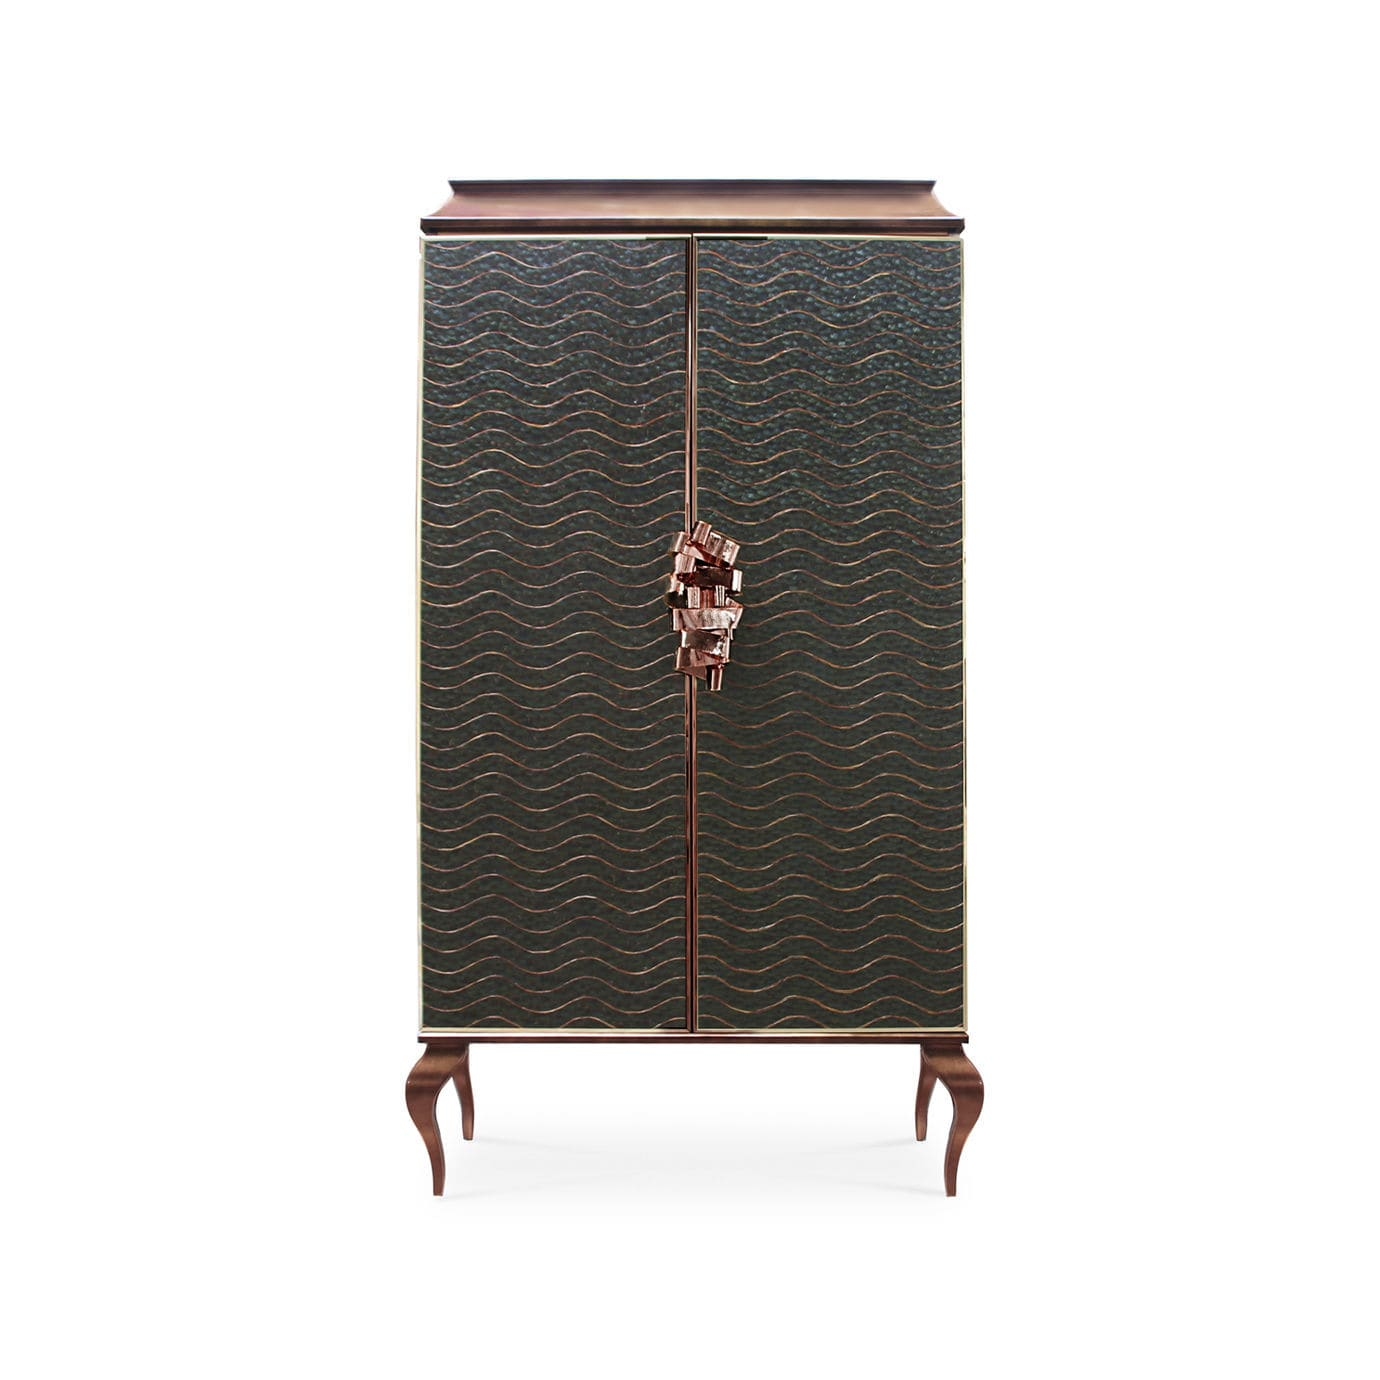 Armadio design nuovo barocco - DIVINE IV - KOKET Love ...